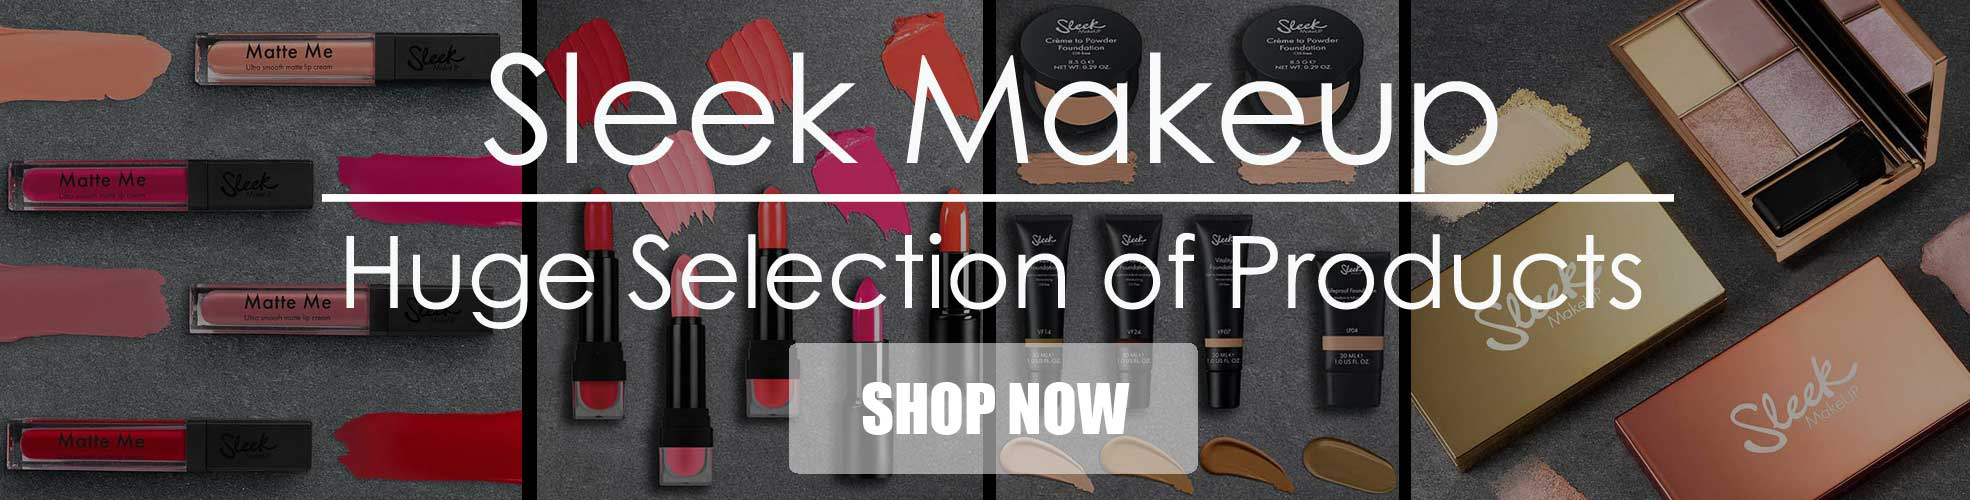 Wholesale Sleek Makeup, Matte me Lipgloss, Lipstick, Blusher